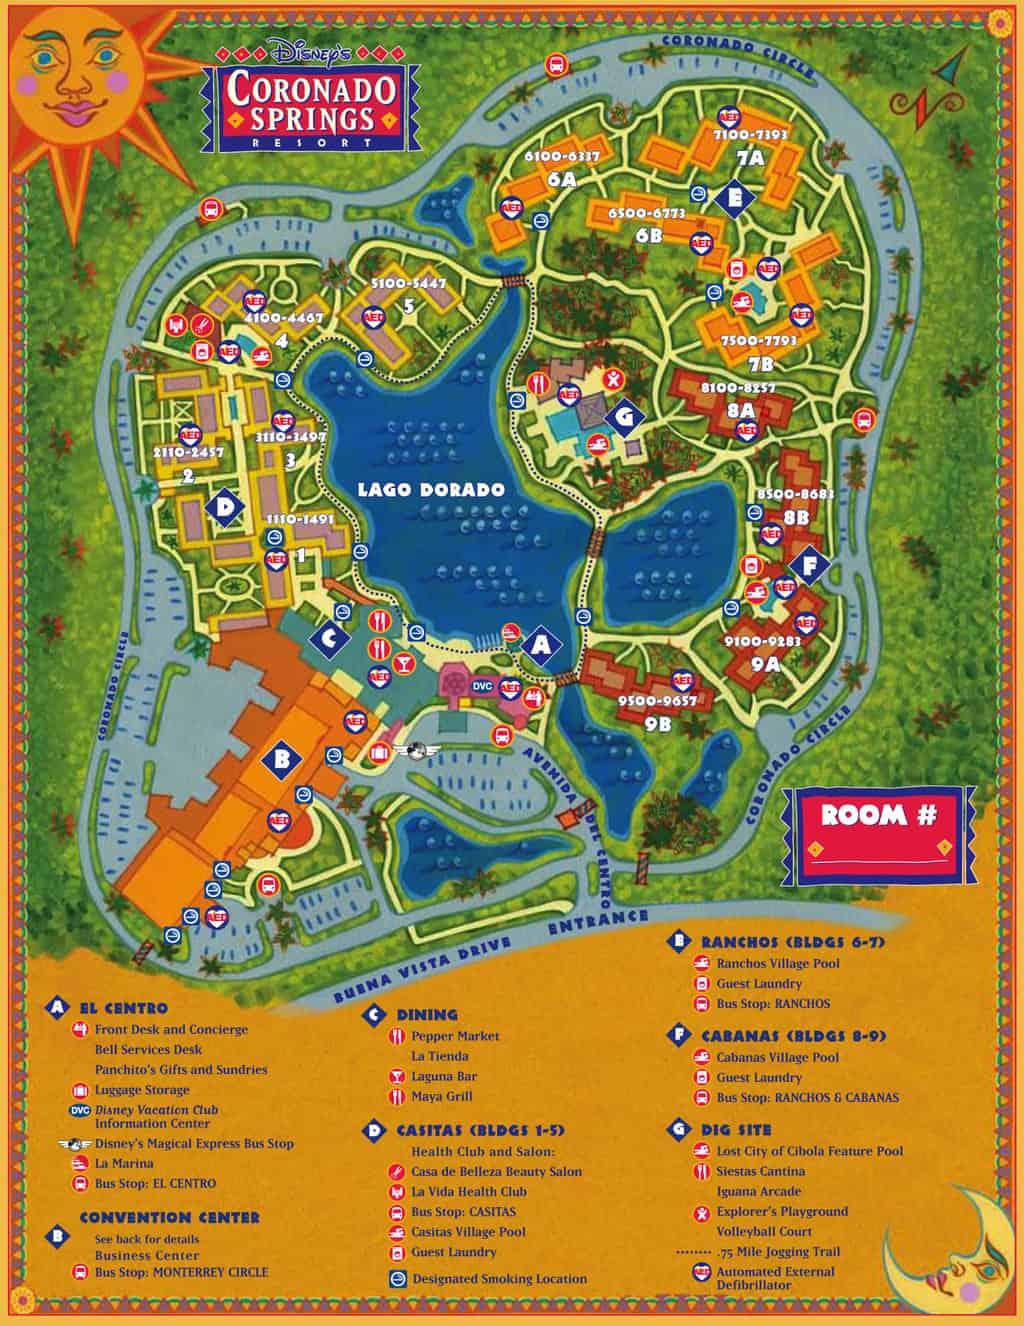 Walt Disney World maps for theme parks, resorts, transportation ...